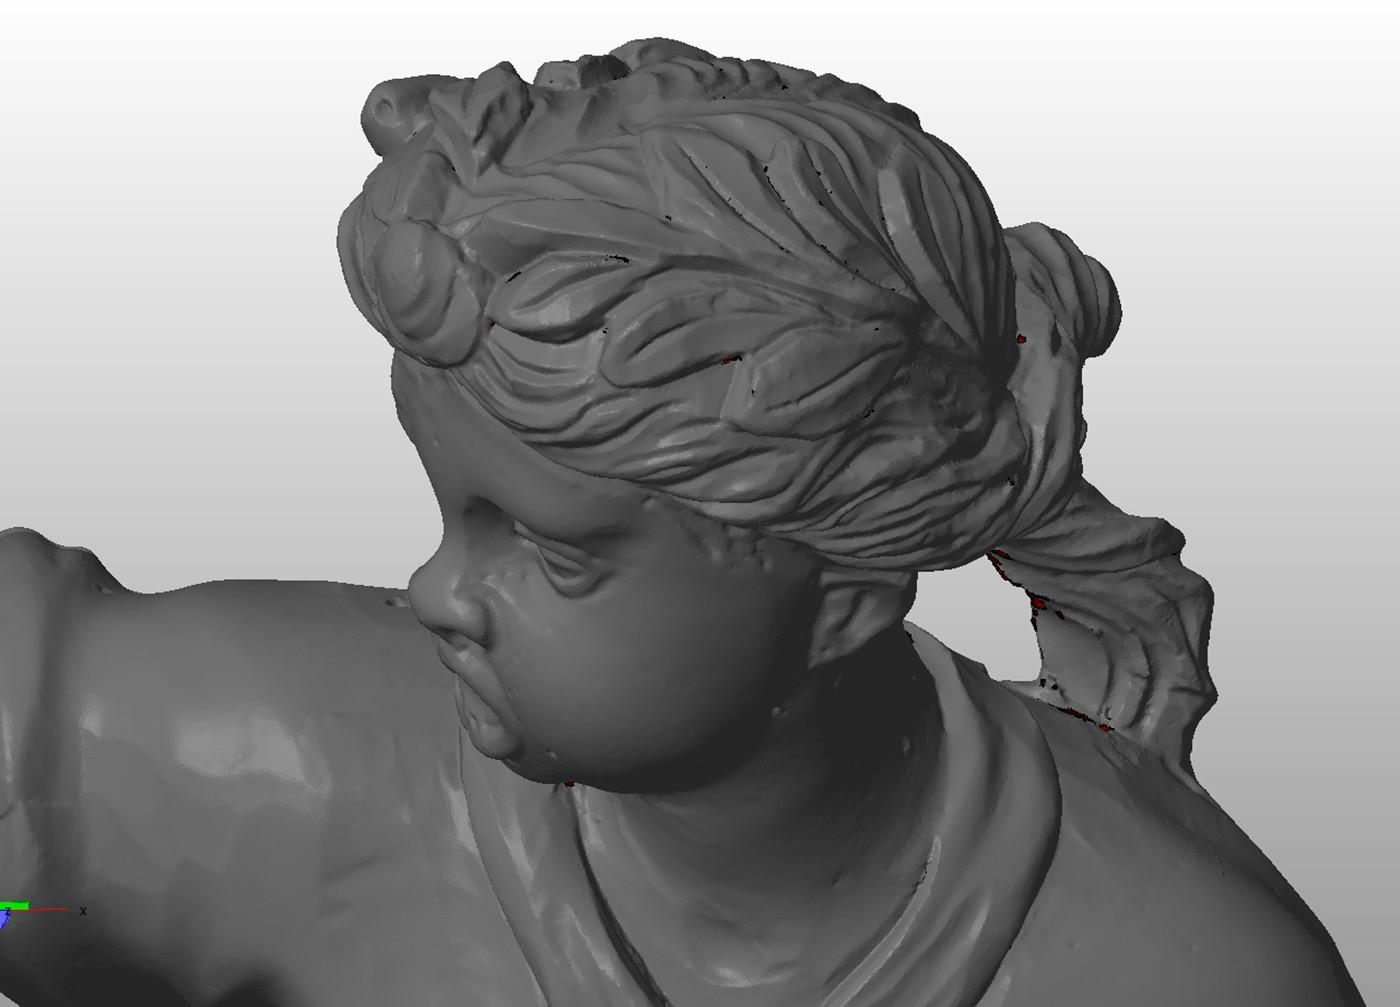 3D scanning monument